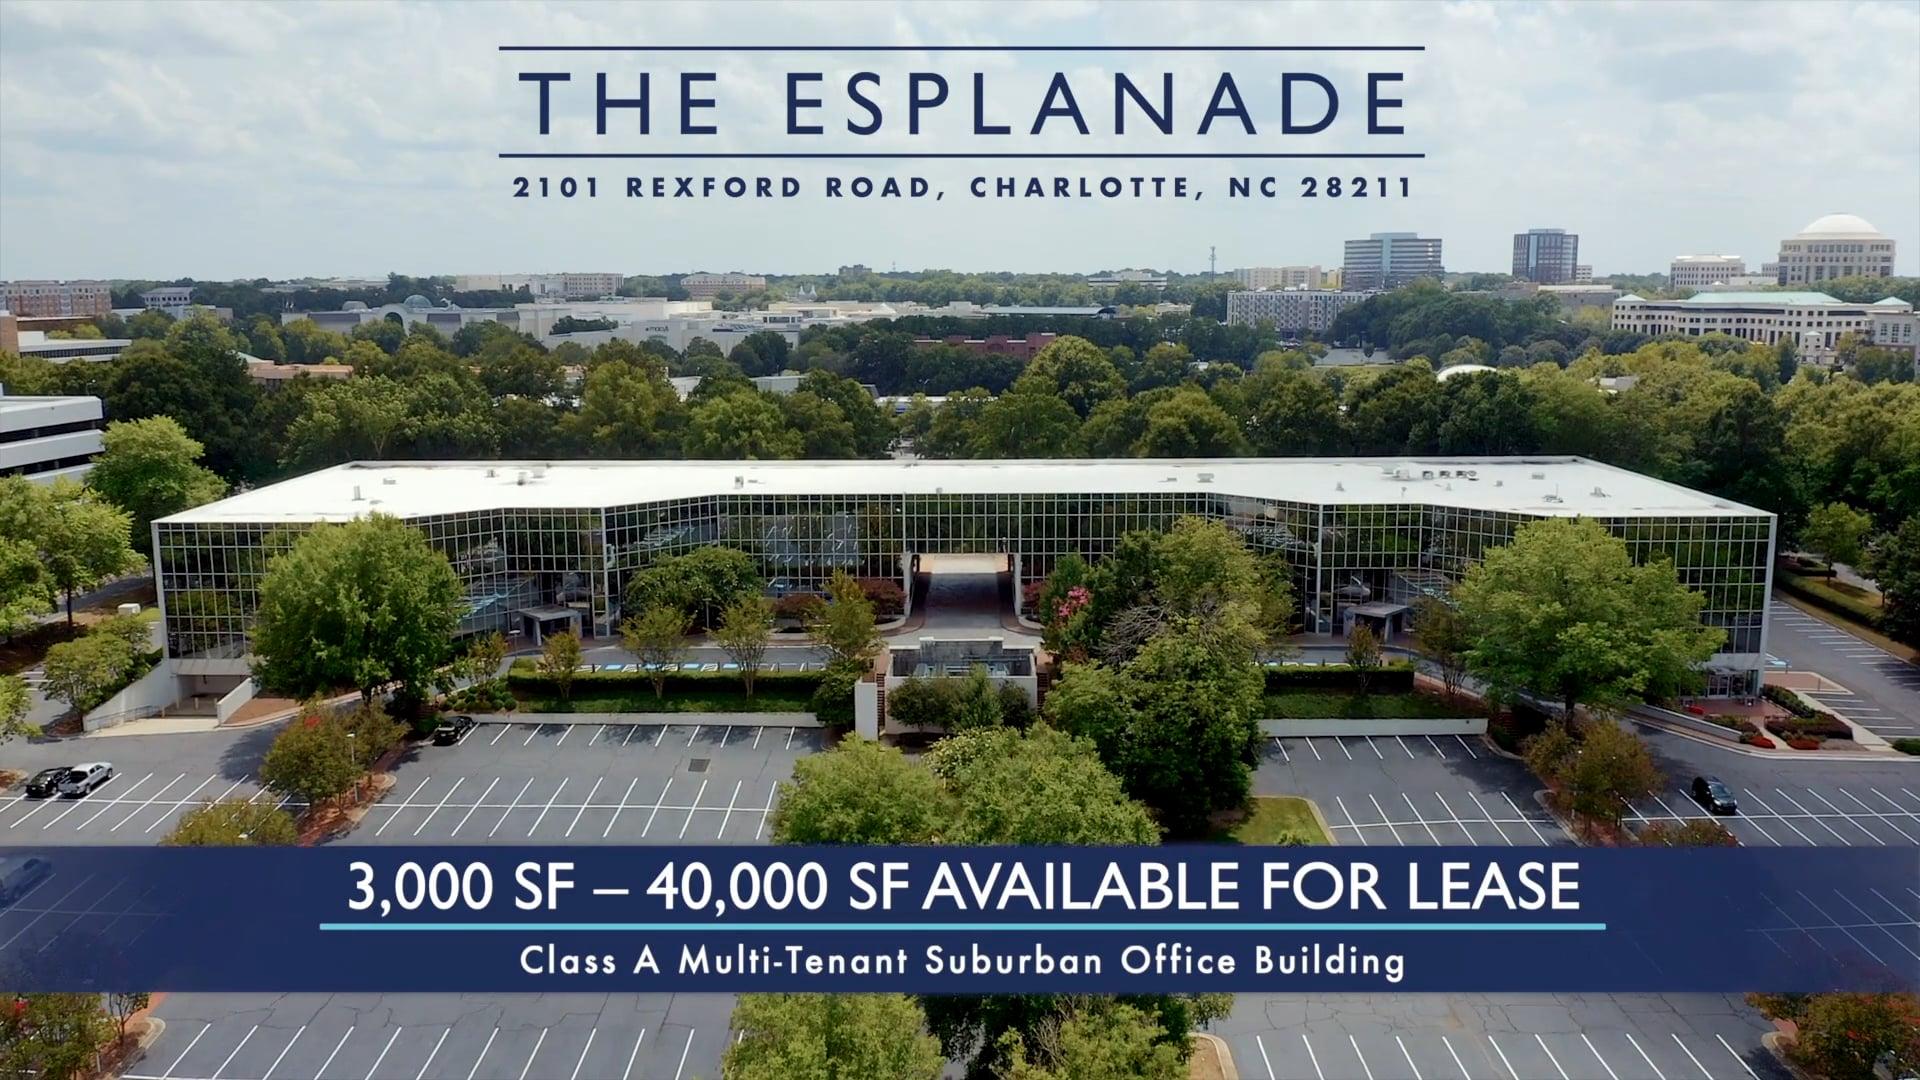 The Esplanade // 2101 Rexford Road, Charlotte, NC 28211